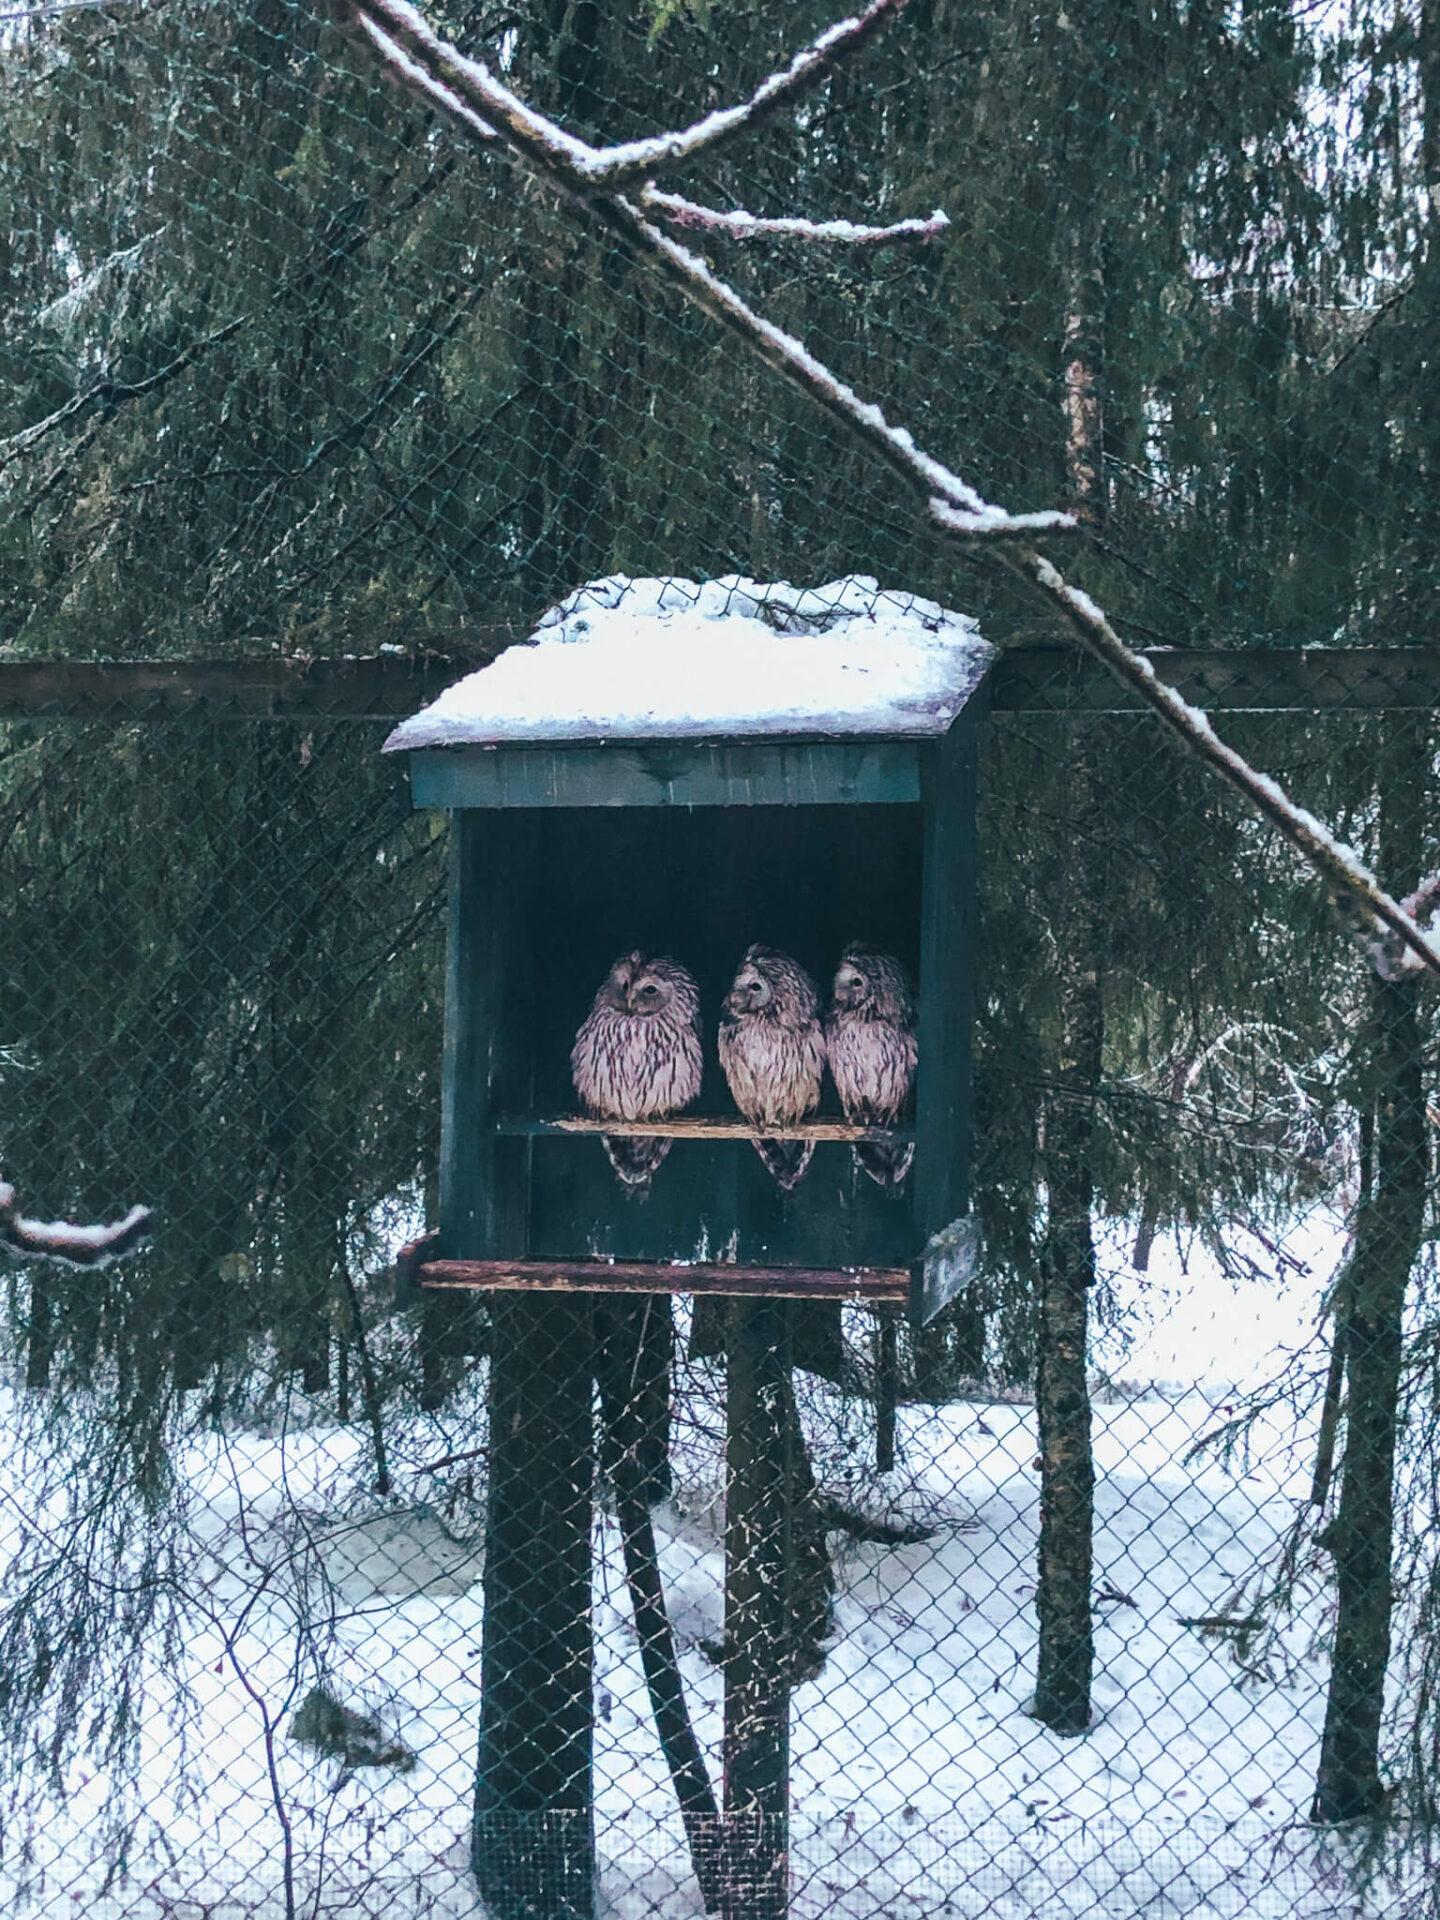 Three owls sitting in an green box